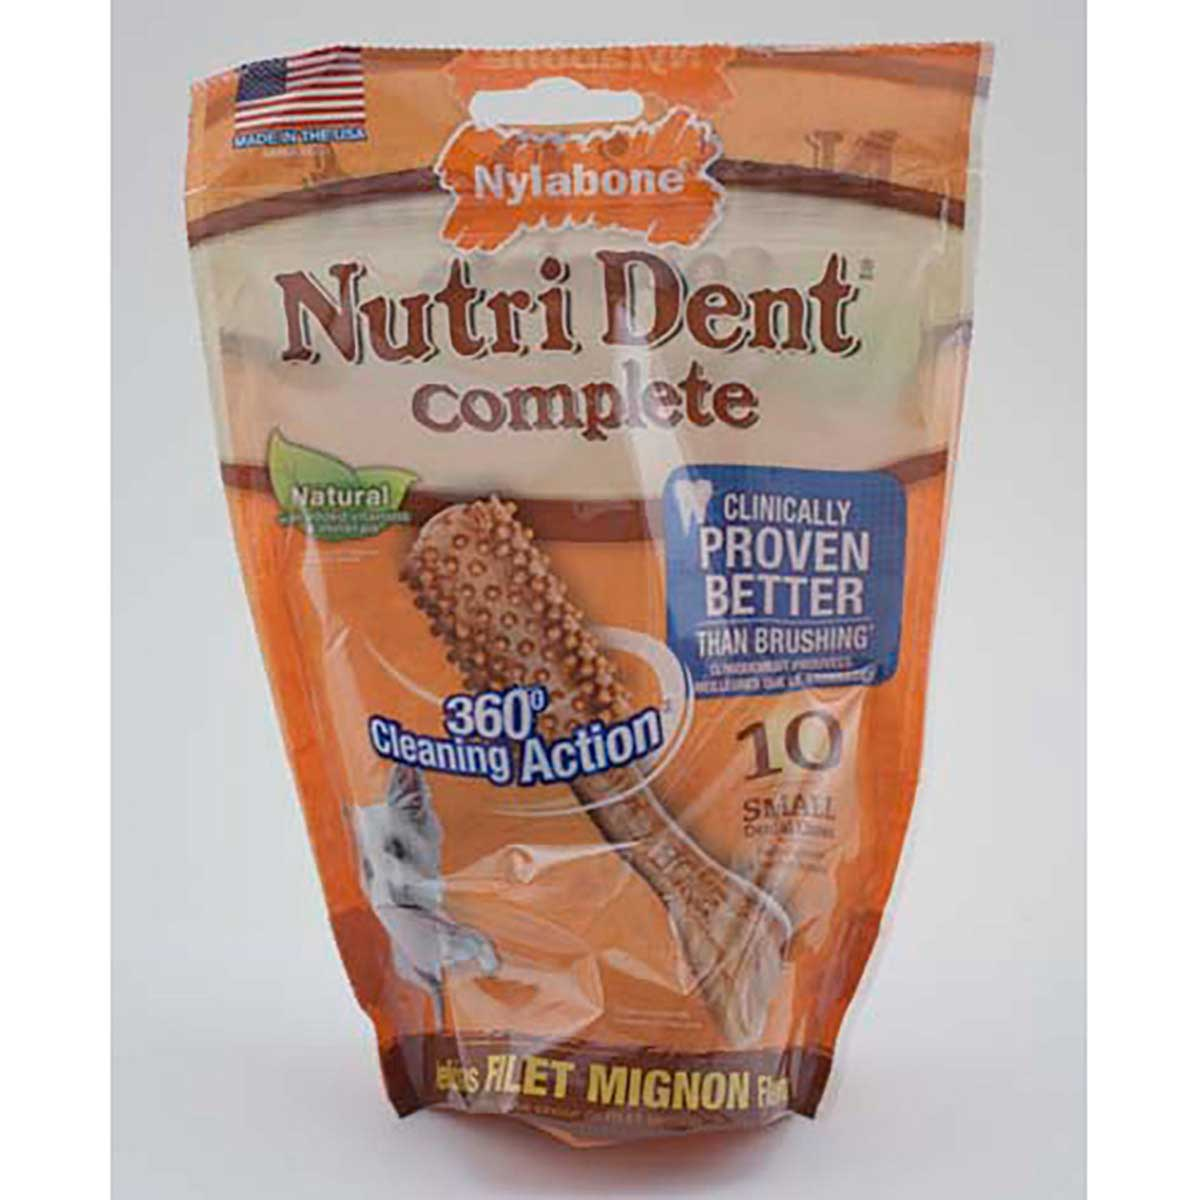 Nylabone Nutri Dent Filet Mignon Small Dental Chews - 10 Count